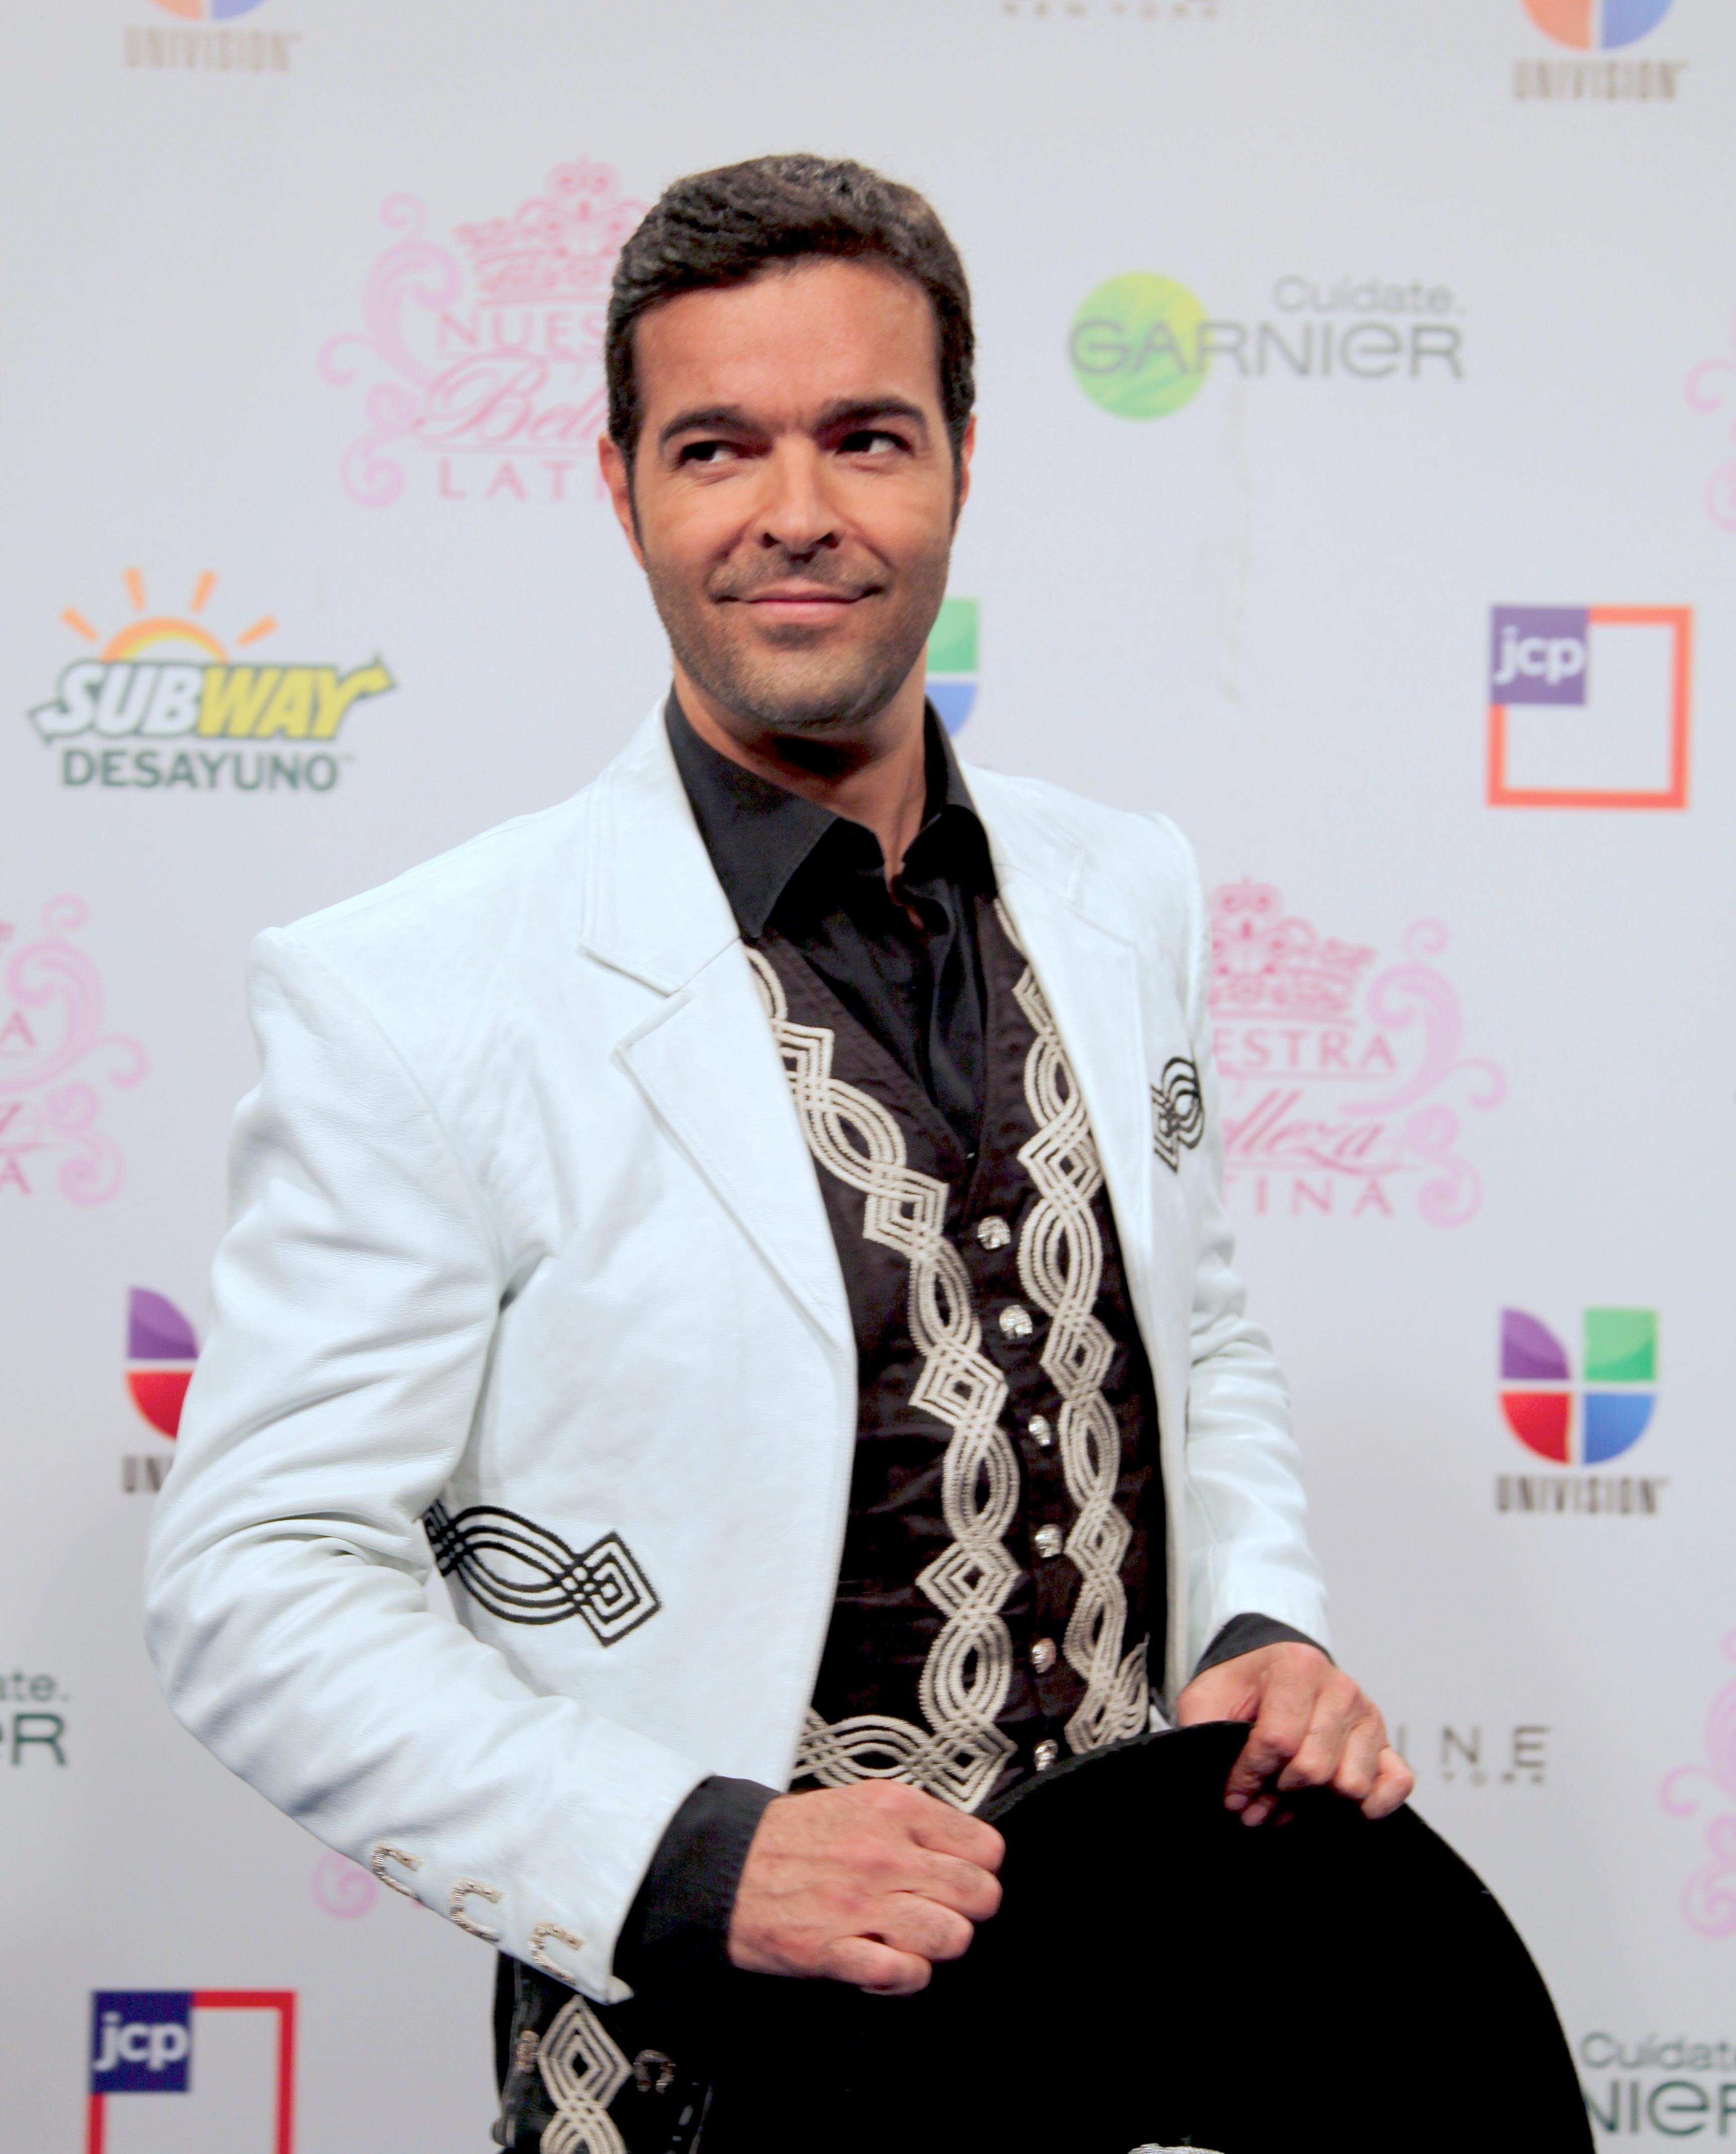 ¡Pablo Montero Podría Interpretar A Joan Sebastian!